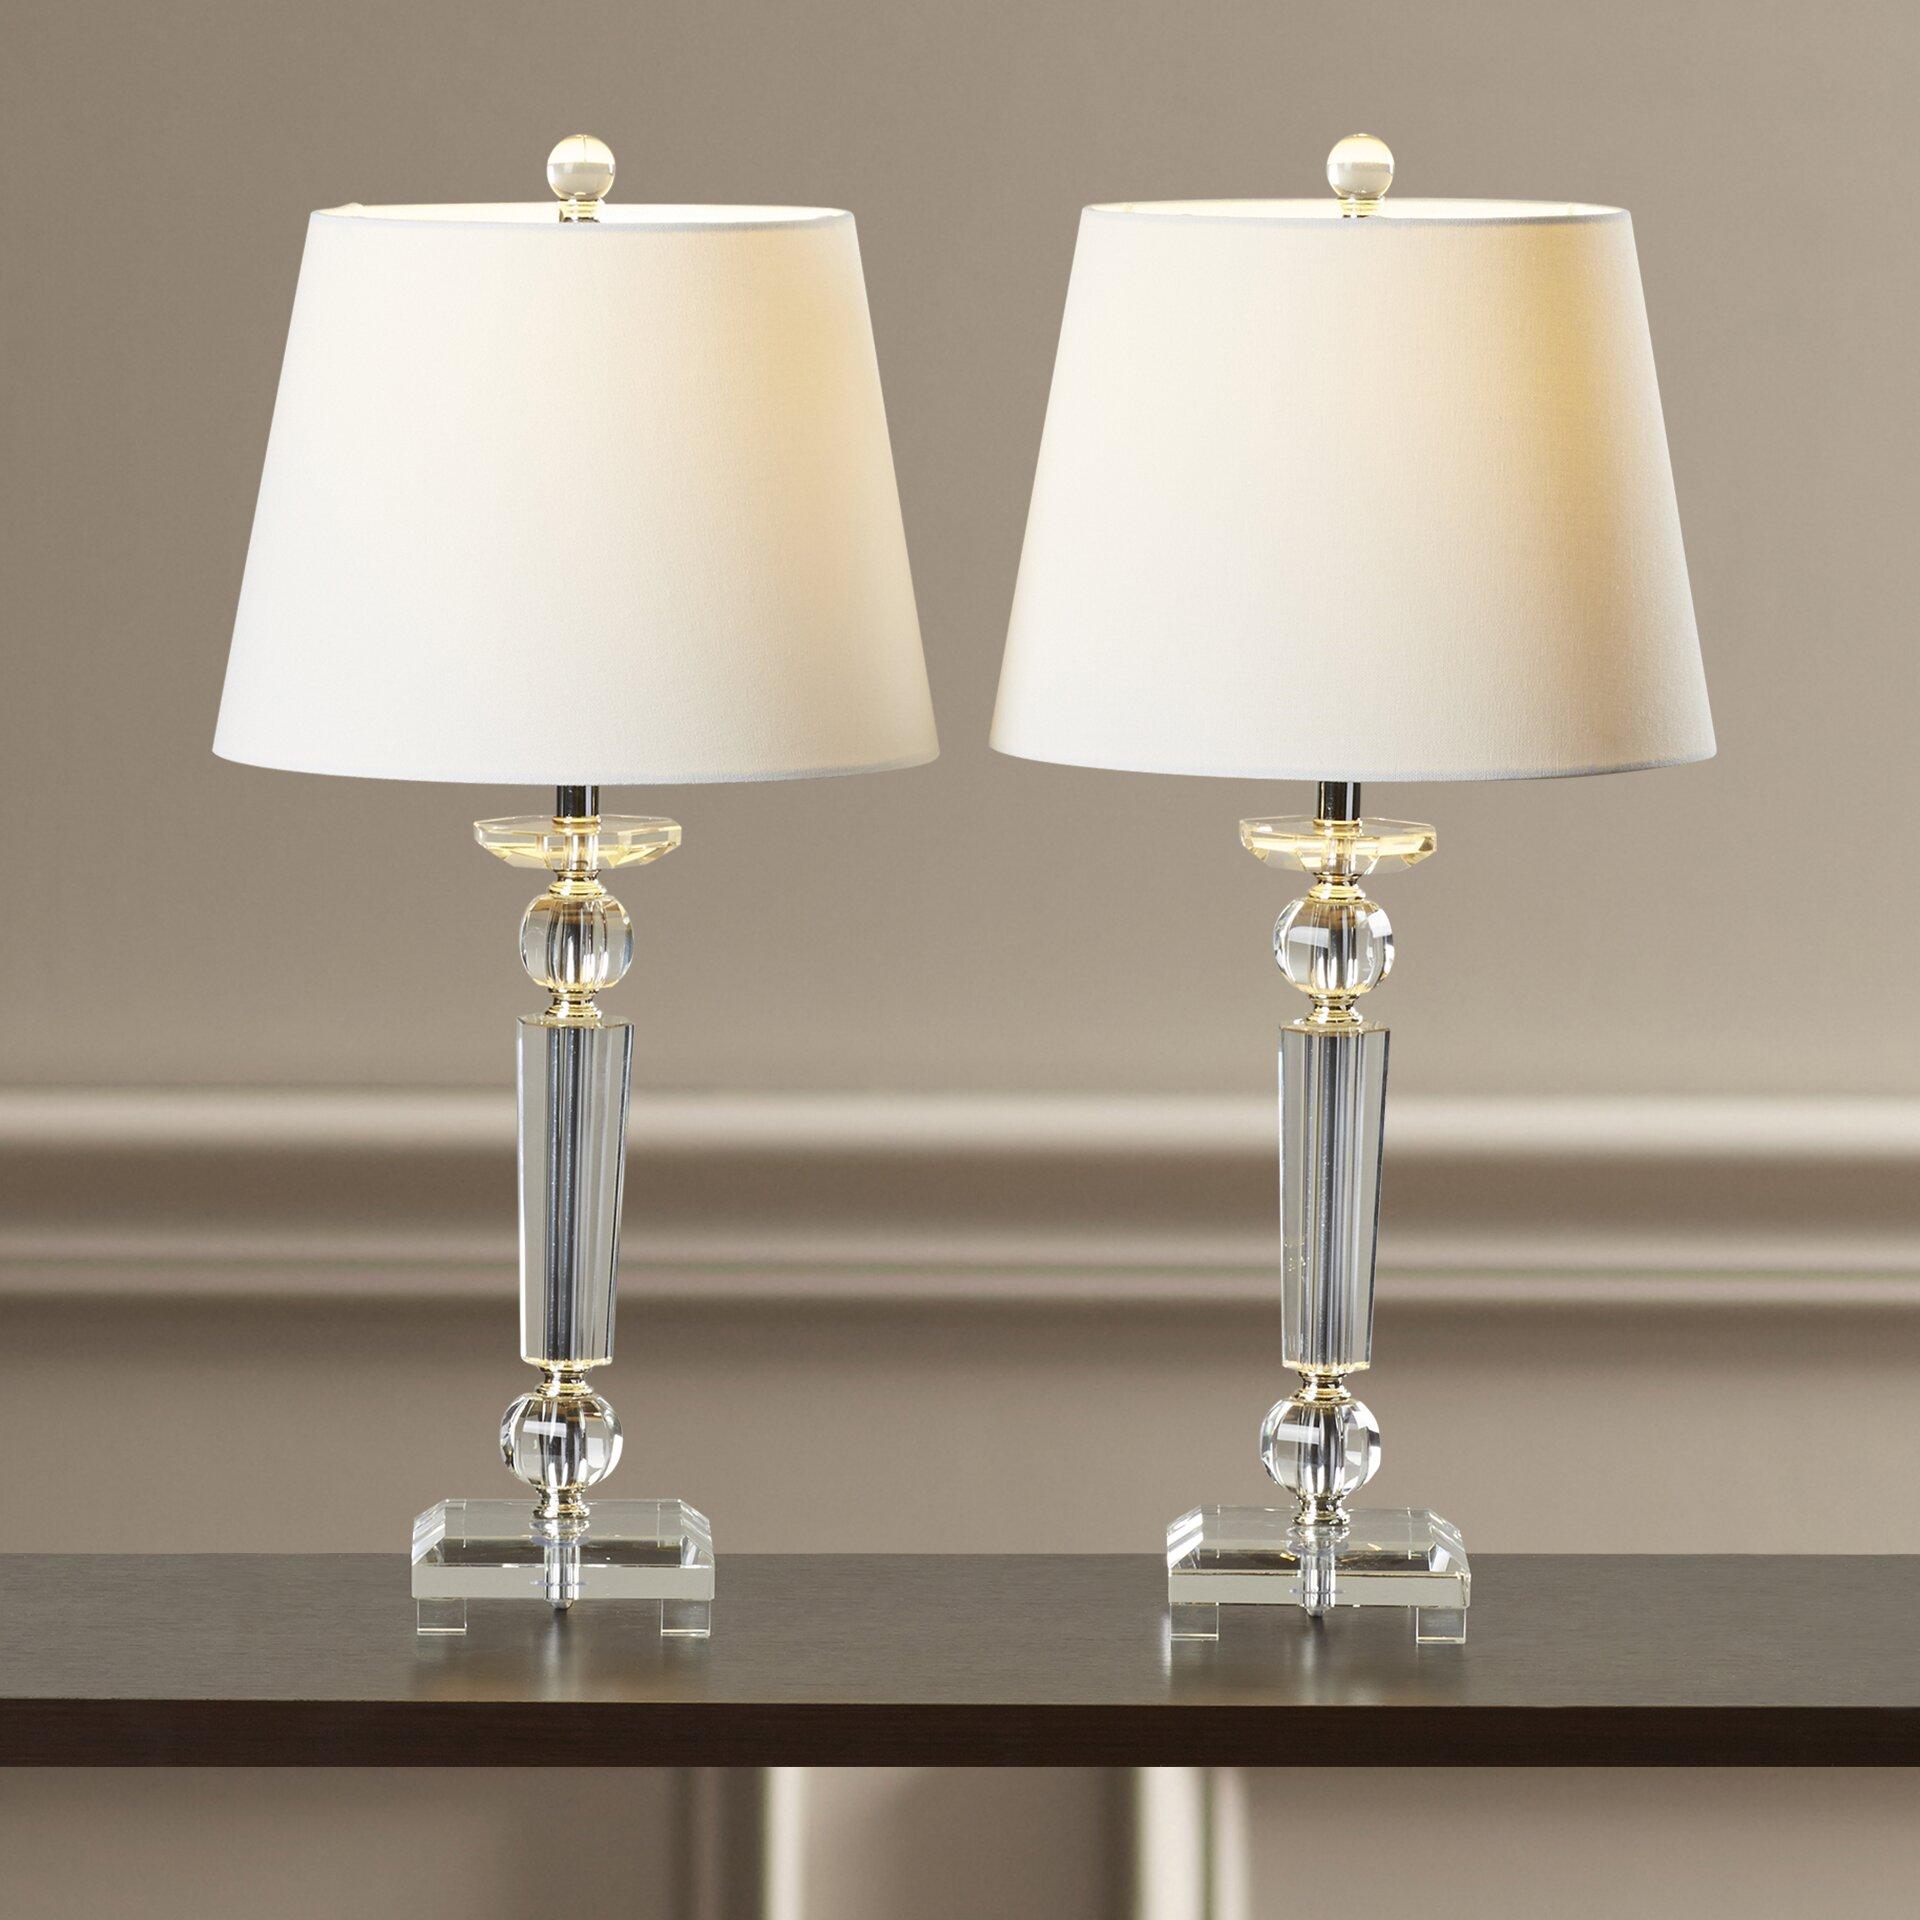 house of hampton marlin 23 table lamps set of 2. Black Bedroom Furniture Sets. Home Design Ideas